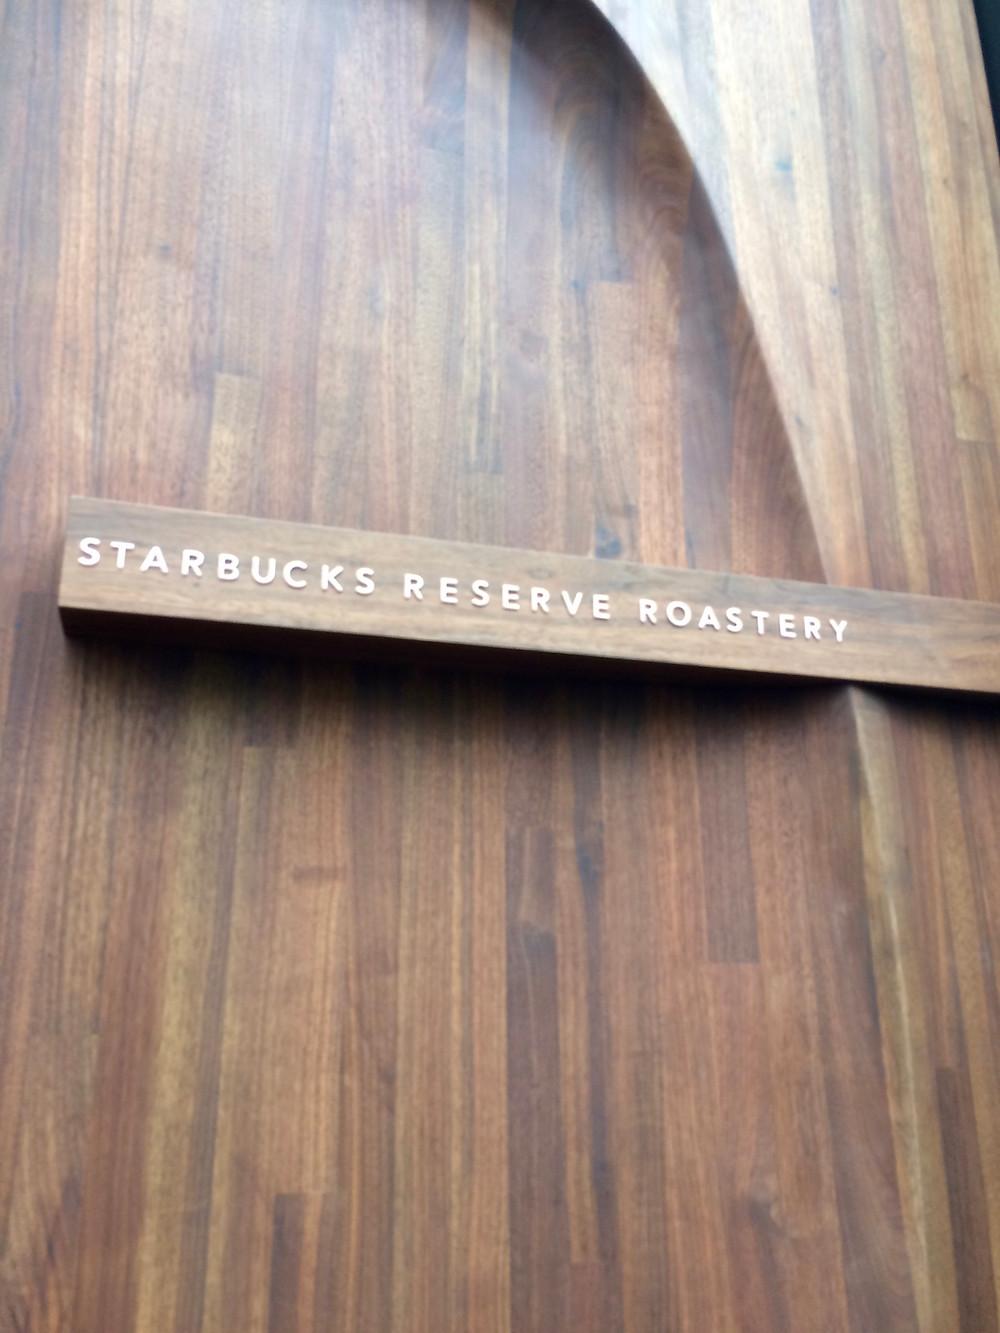 Starbucks Reserve Roastery, the largest Starbucks in the world, Shanghai, China